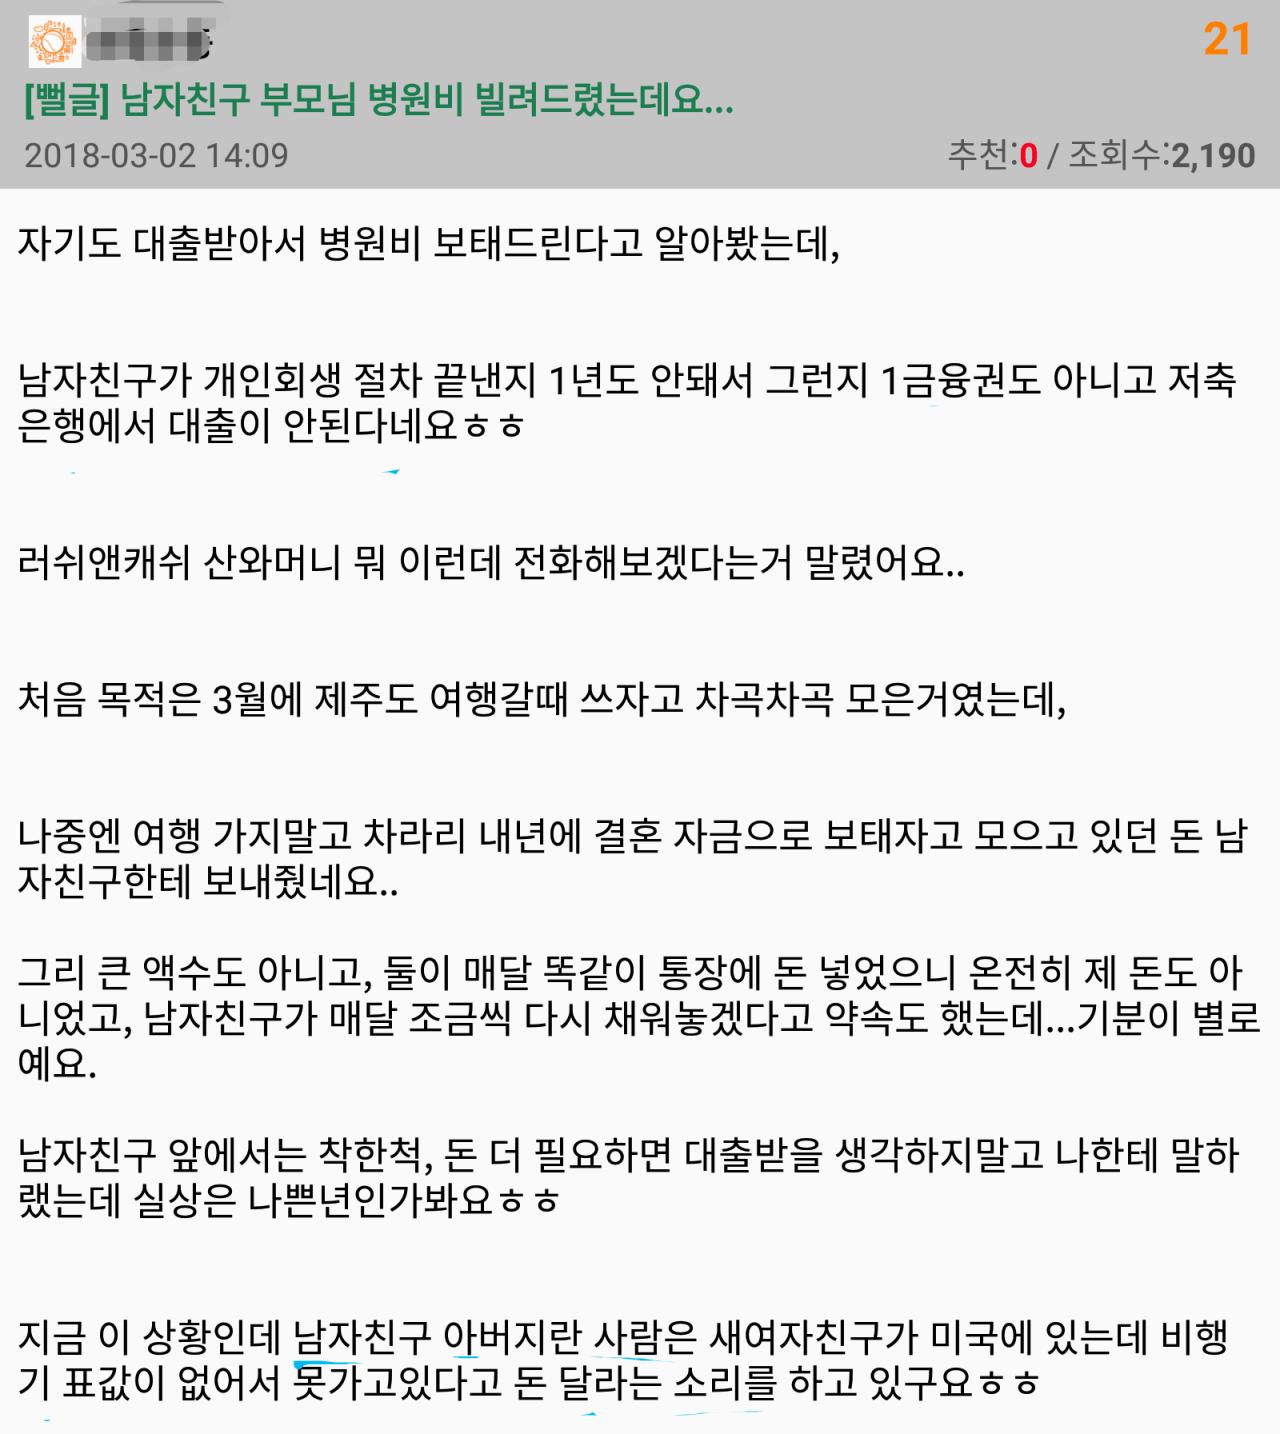 IMG_20180515_134206.png 현재 엠팍에서 댓글 500개 넘긴 예비신부 사연.jpg